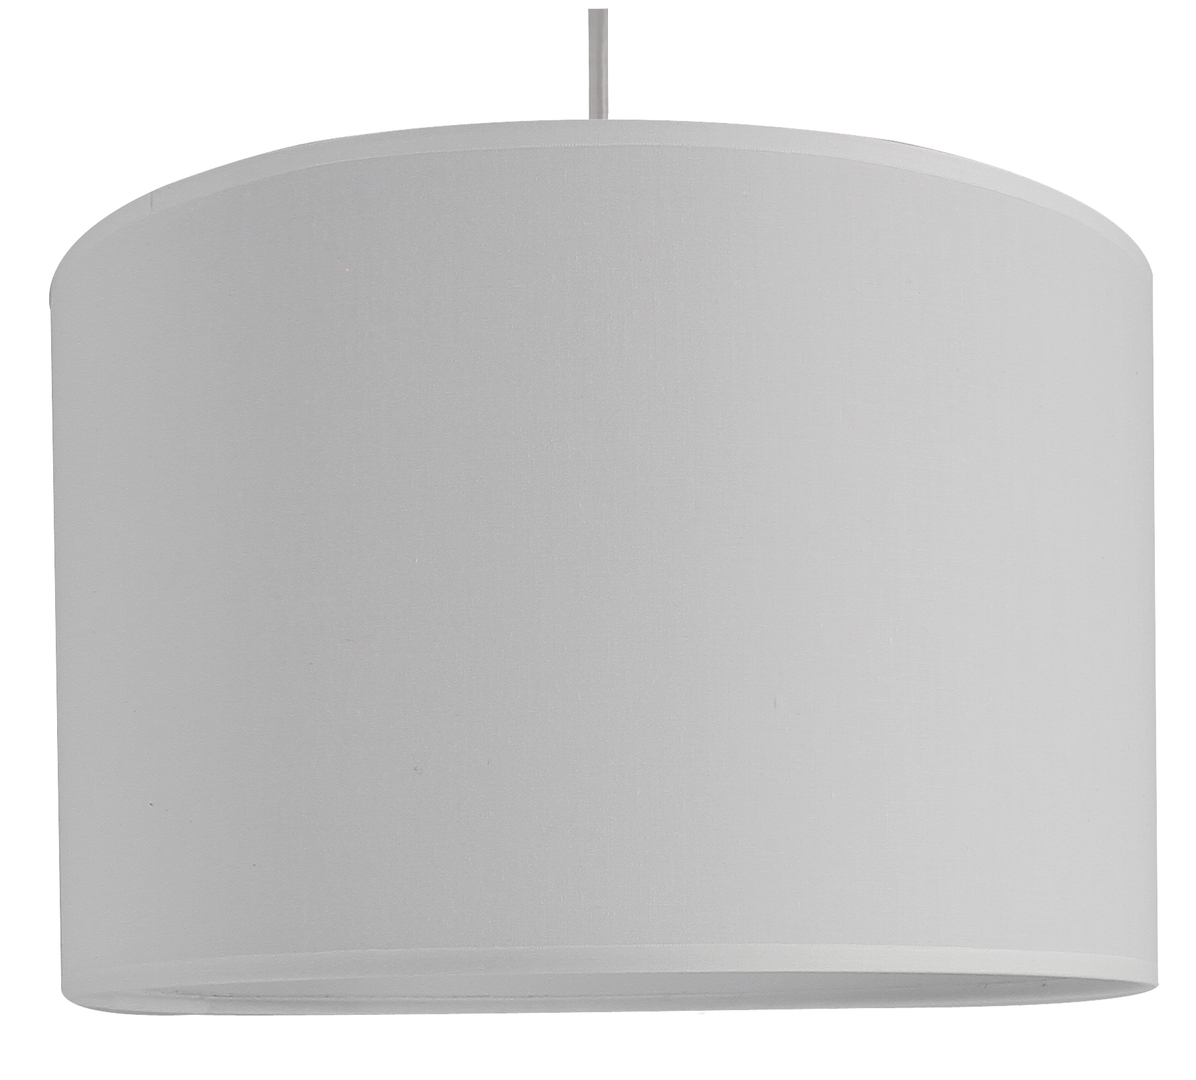 Suspension cylindre blanche transparent